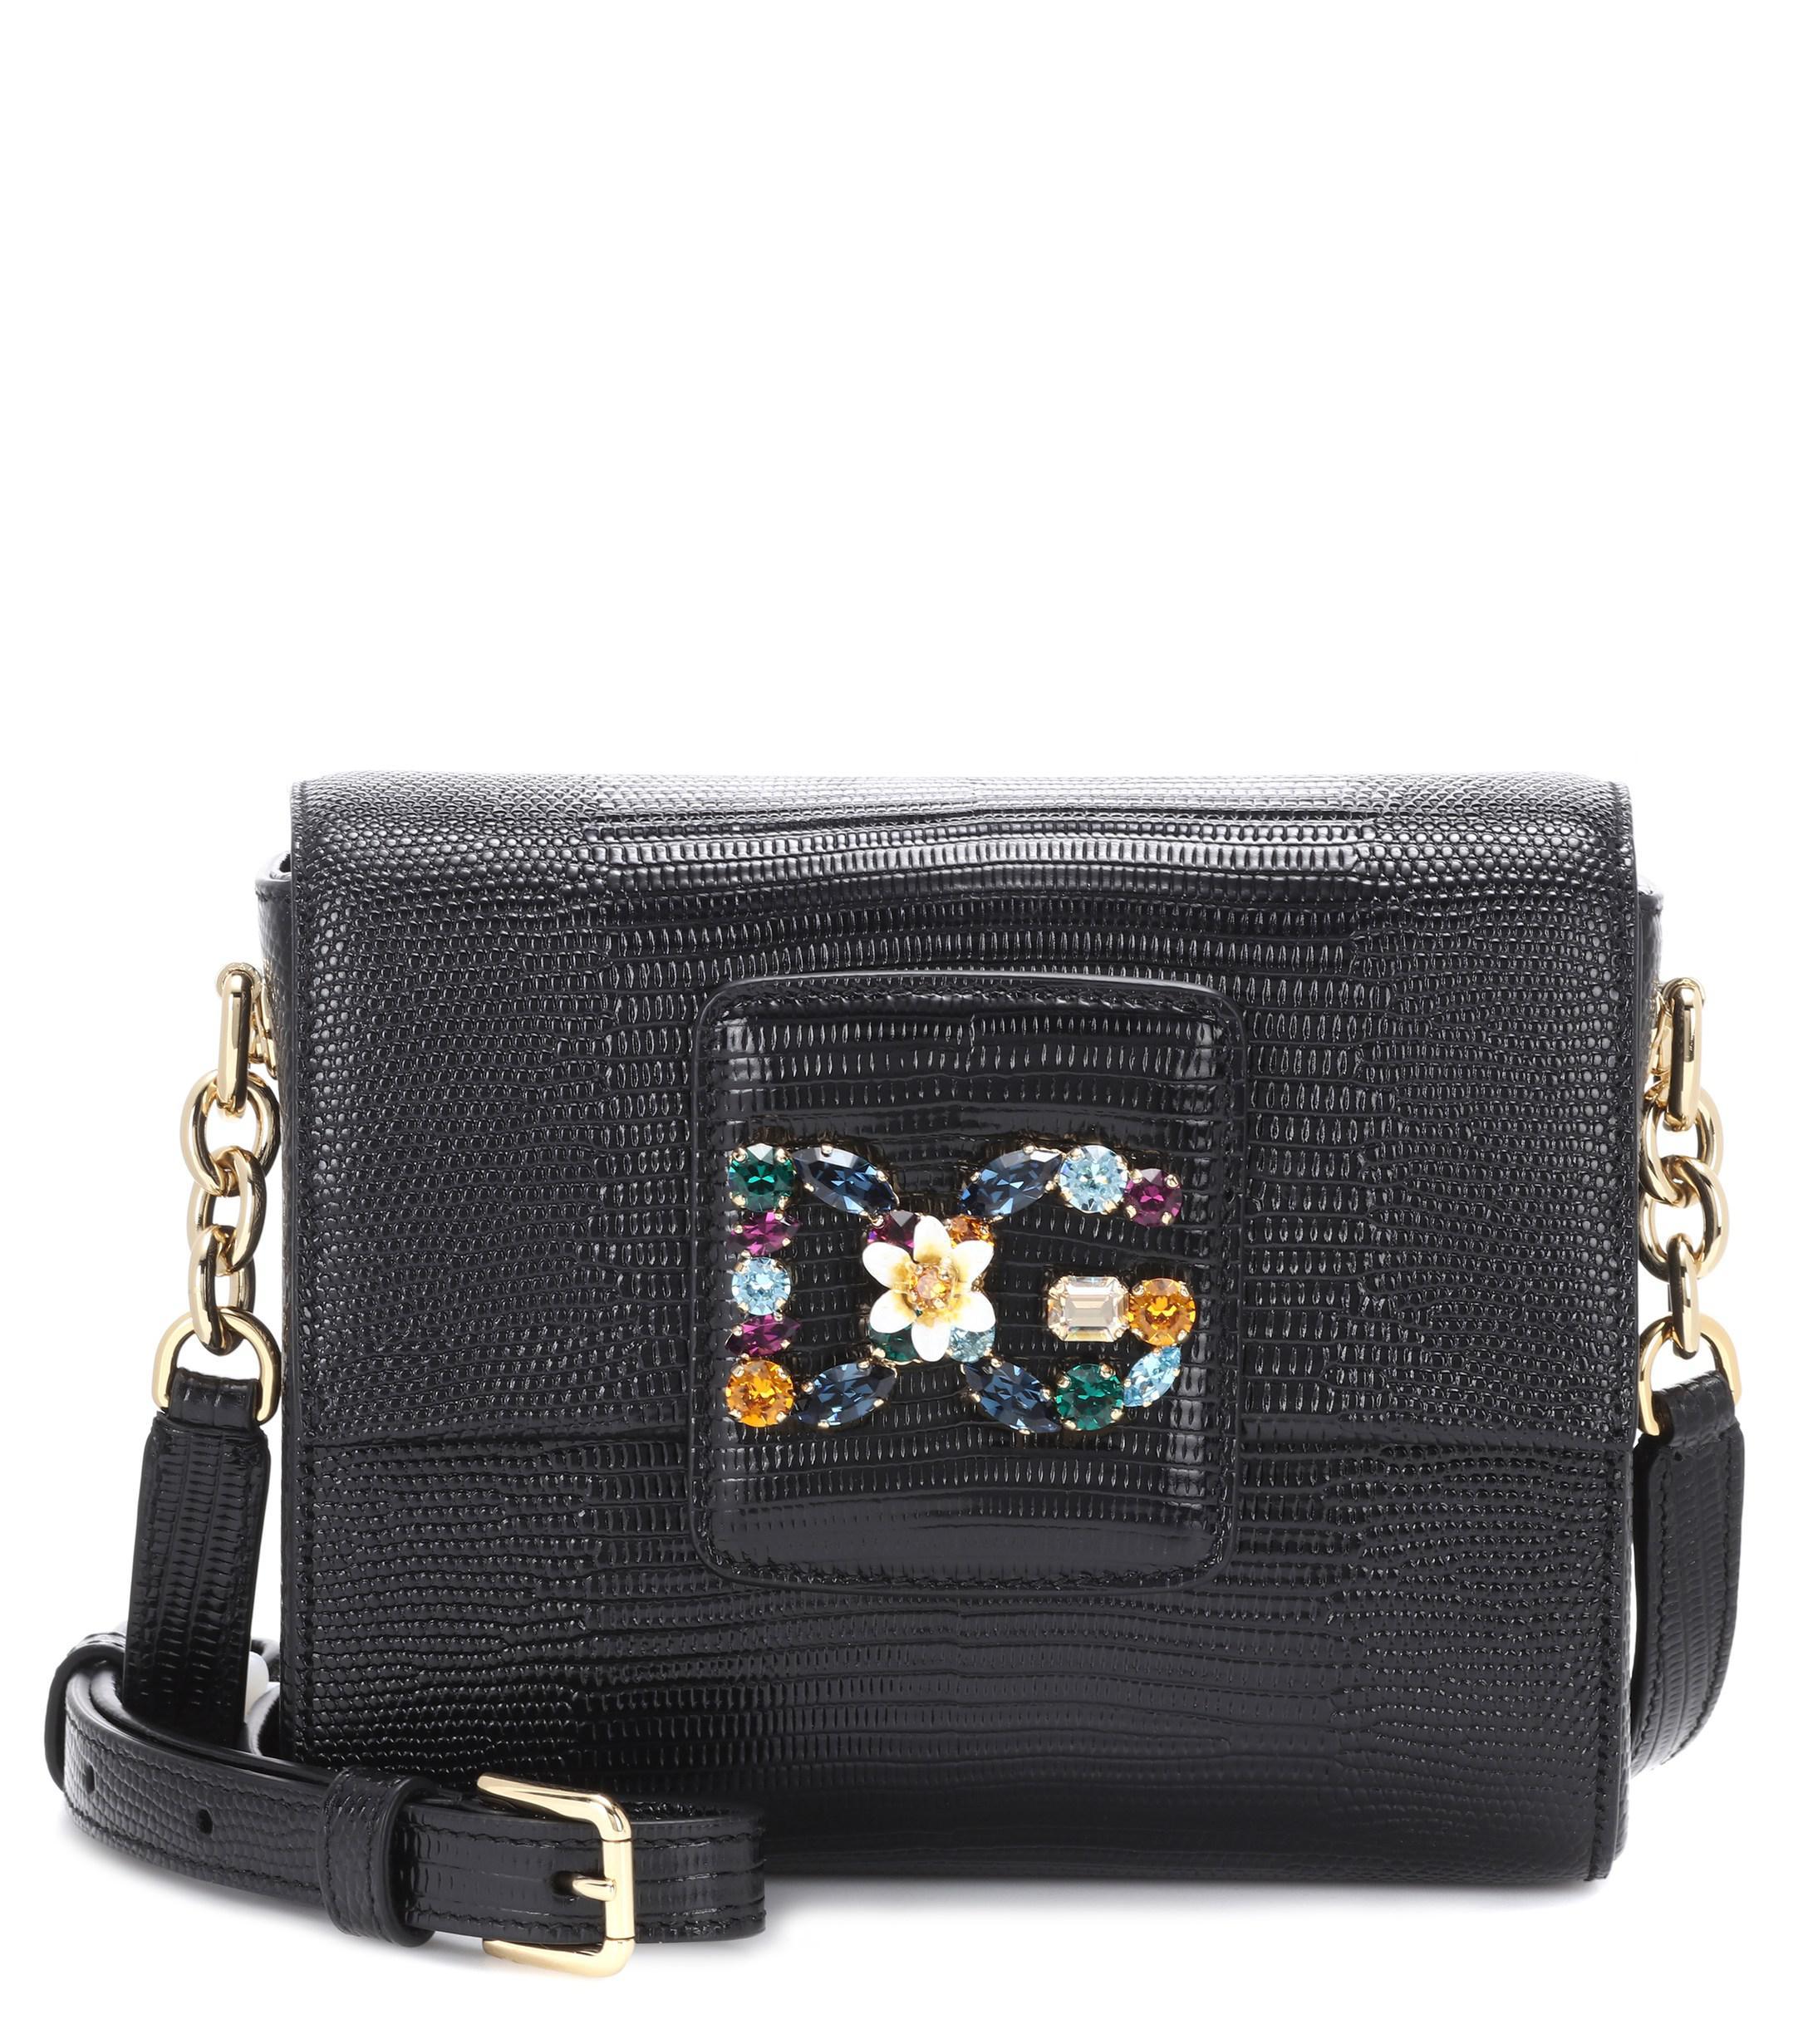 ac6a5c7c75 Lyst - Dolce   Gabbana Dg Millennials Mini Leather Shoulder Bag in Black